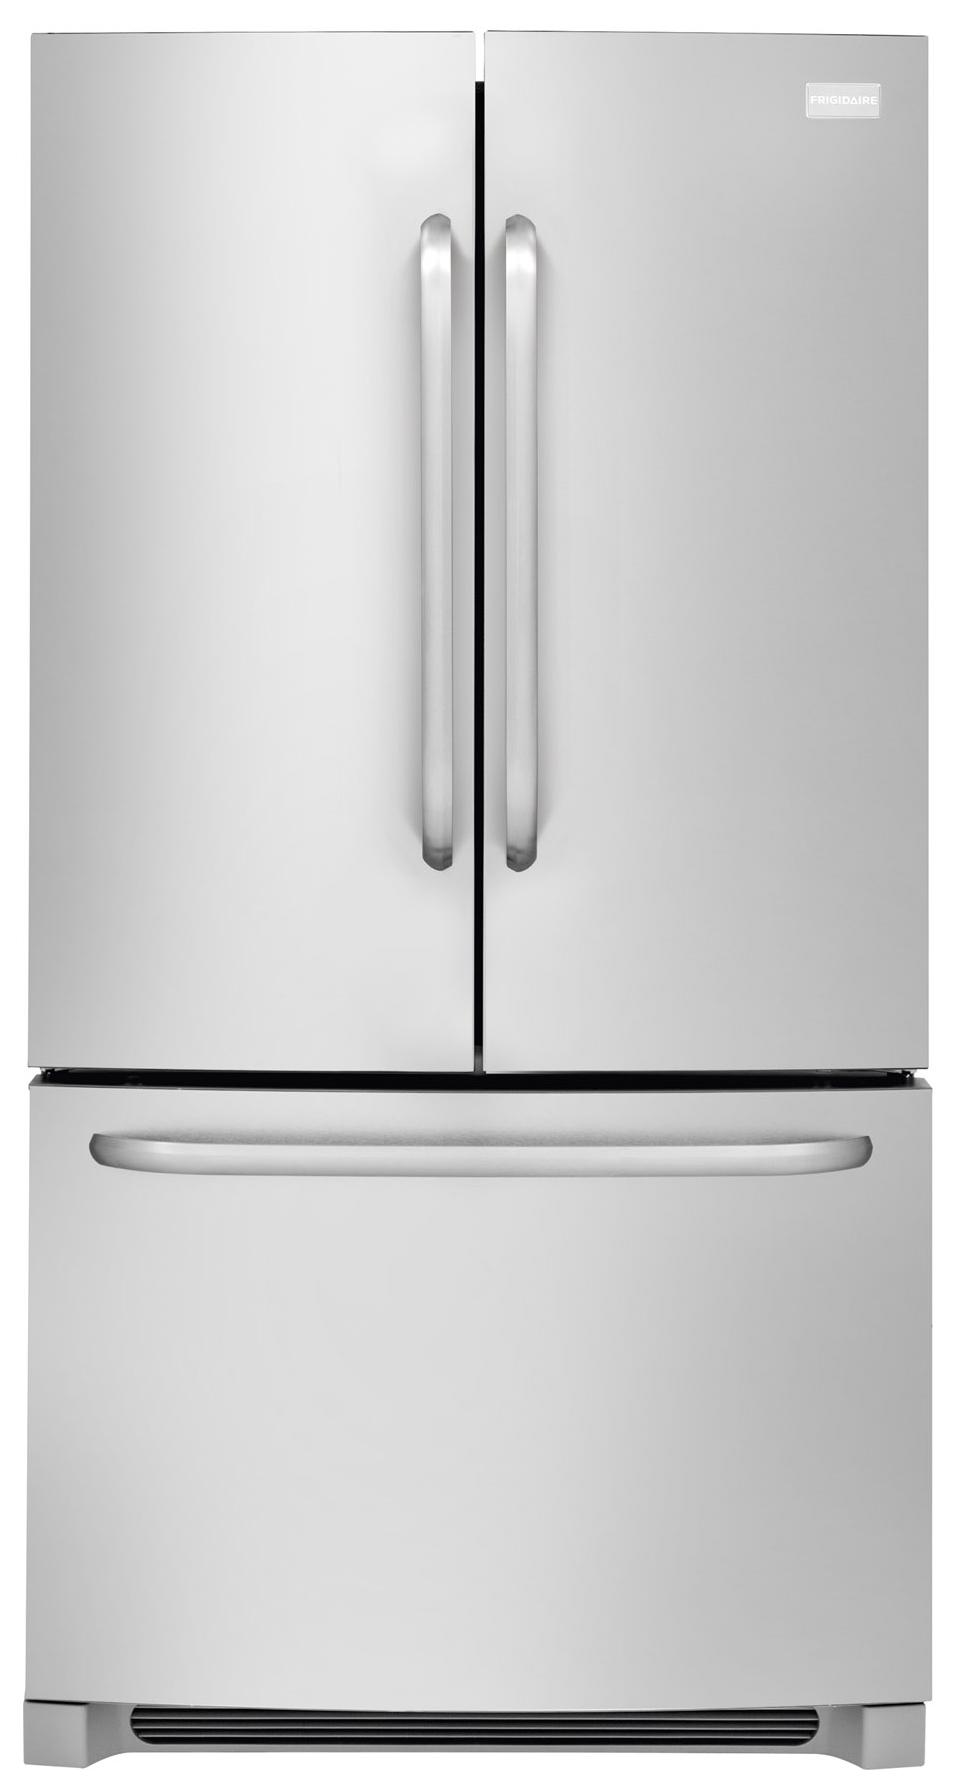 Frigidaire French Door Refrigerators 27.8 Cu. Ft. French Door Refrigerator - Item Number: FFHN2740PS